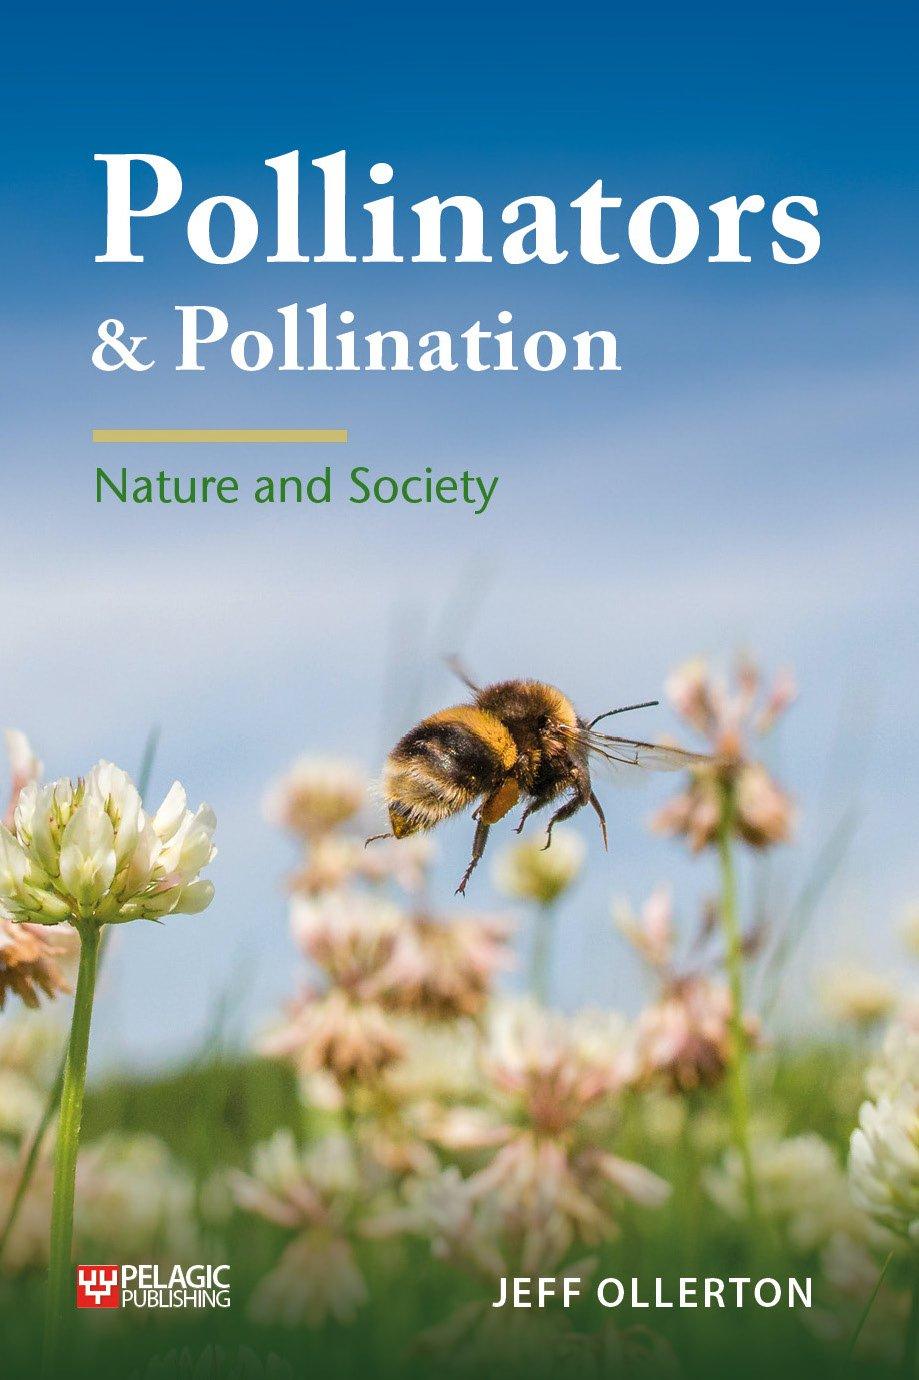 PollinatorsandPollination-frontcover